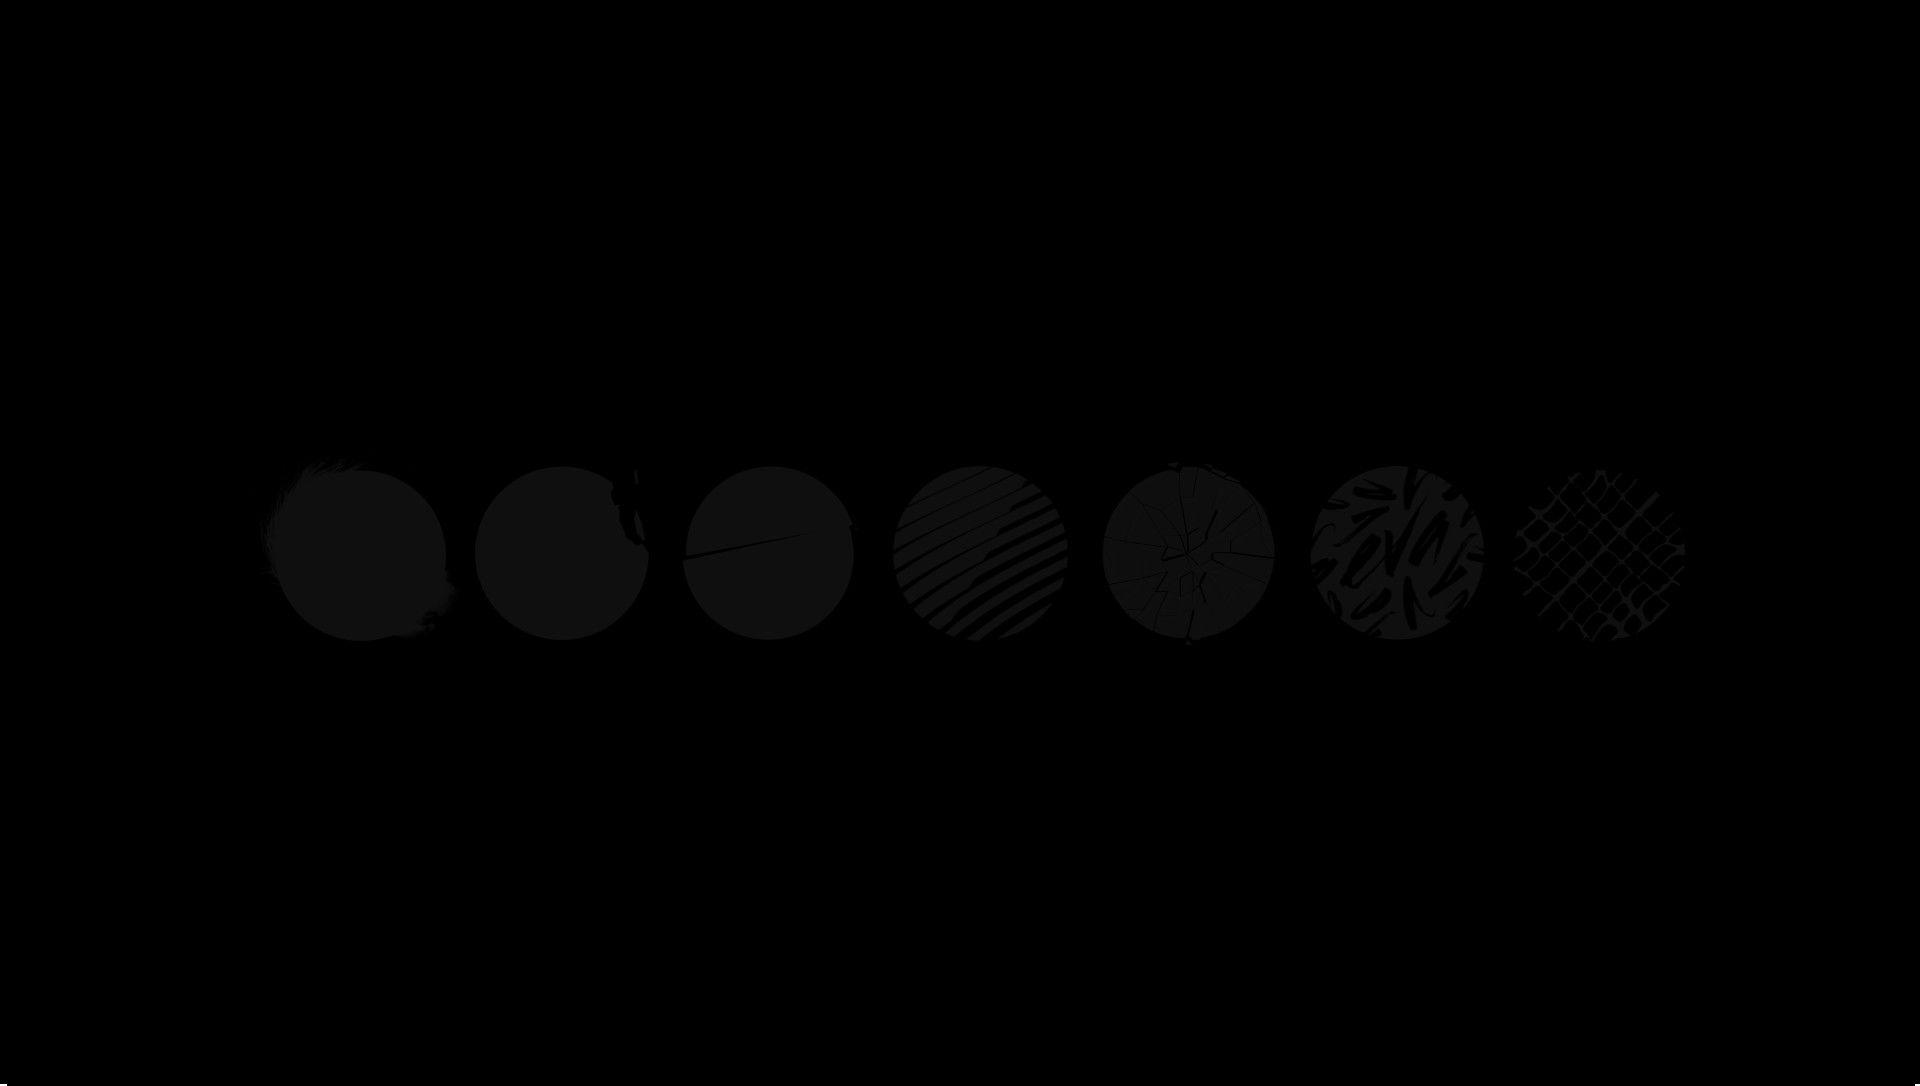 BTS Aesthetic Desktop Wallpapers Top Free BTS Aesthetic